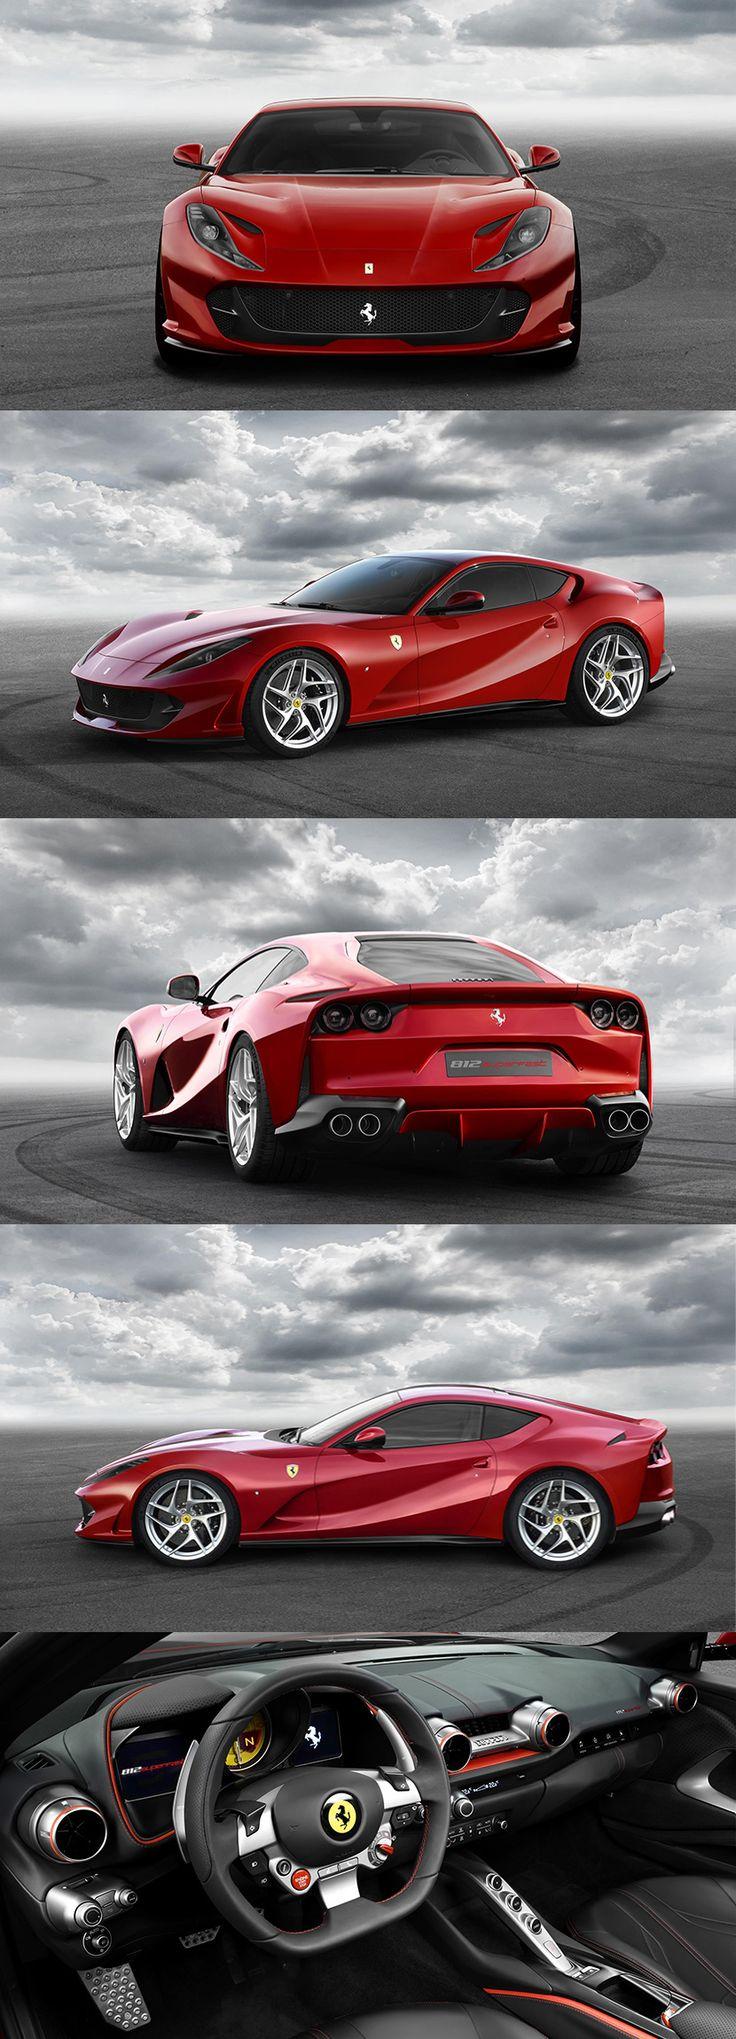 Ferrari 812 superfast 800 hp